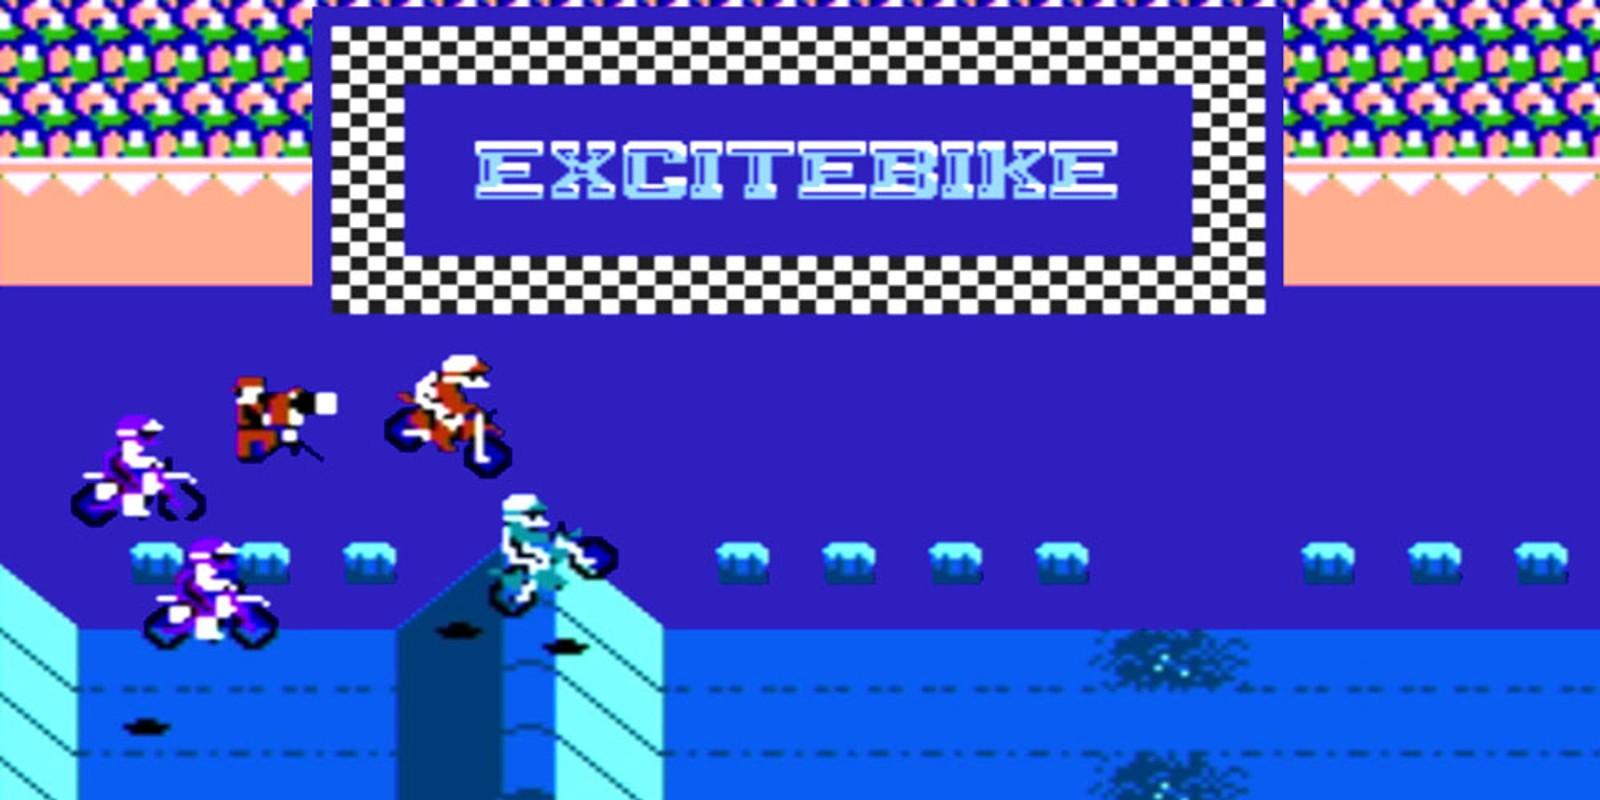 Excitebike Nes Games Nintendo